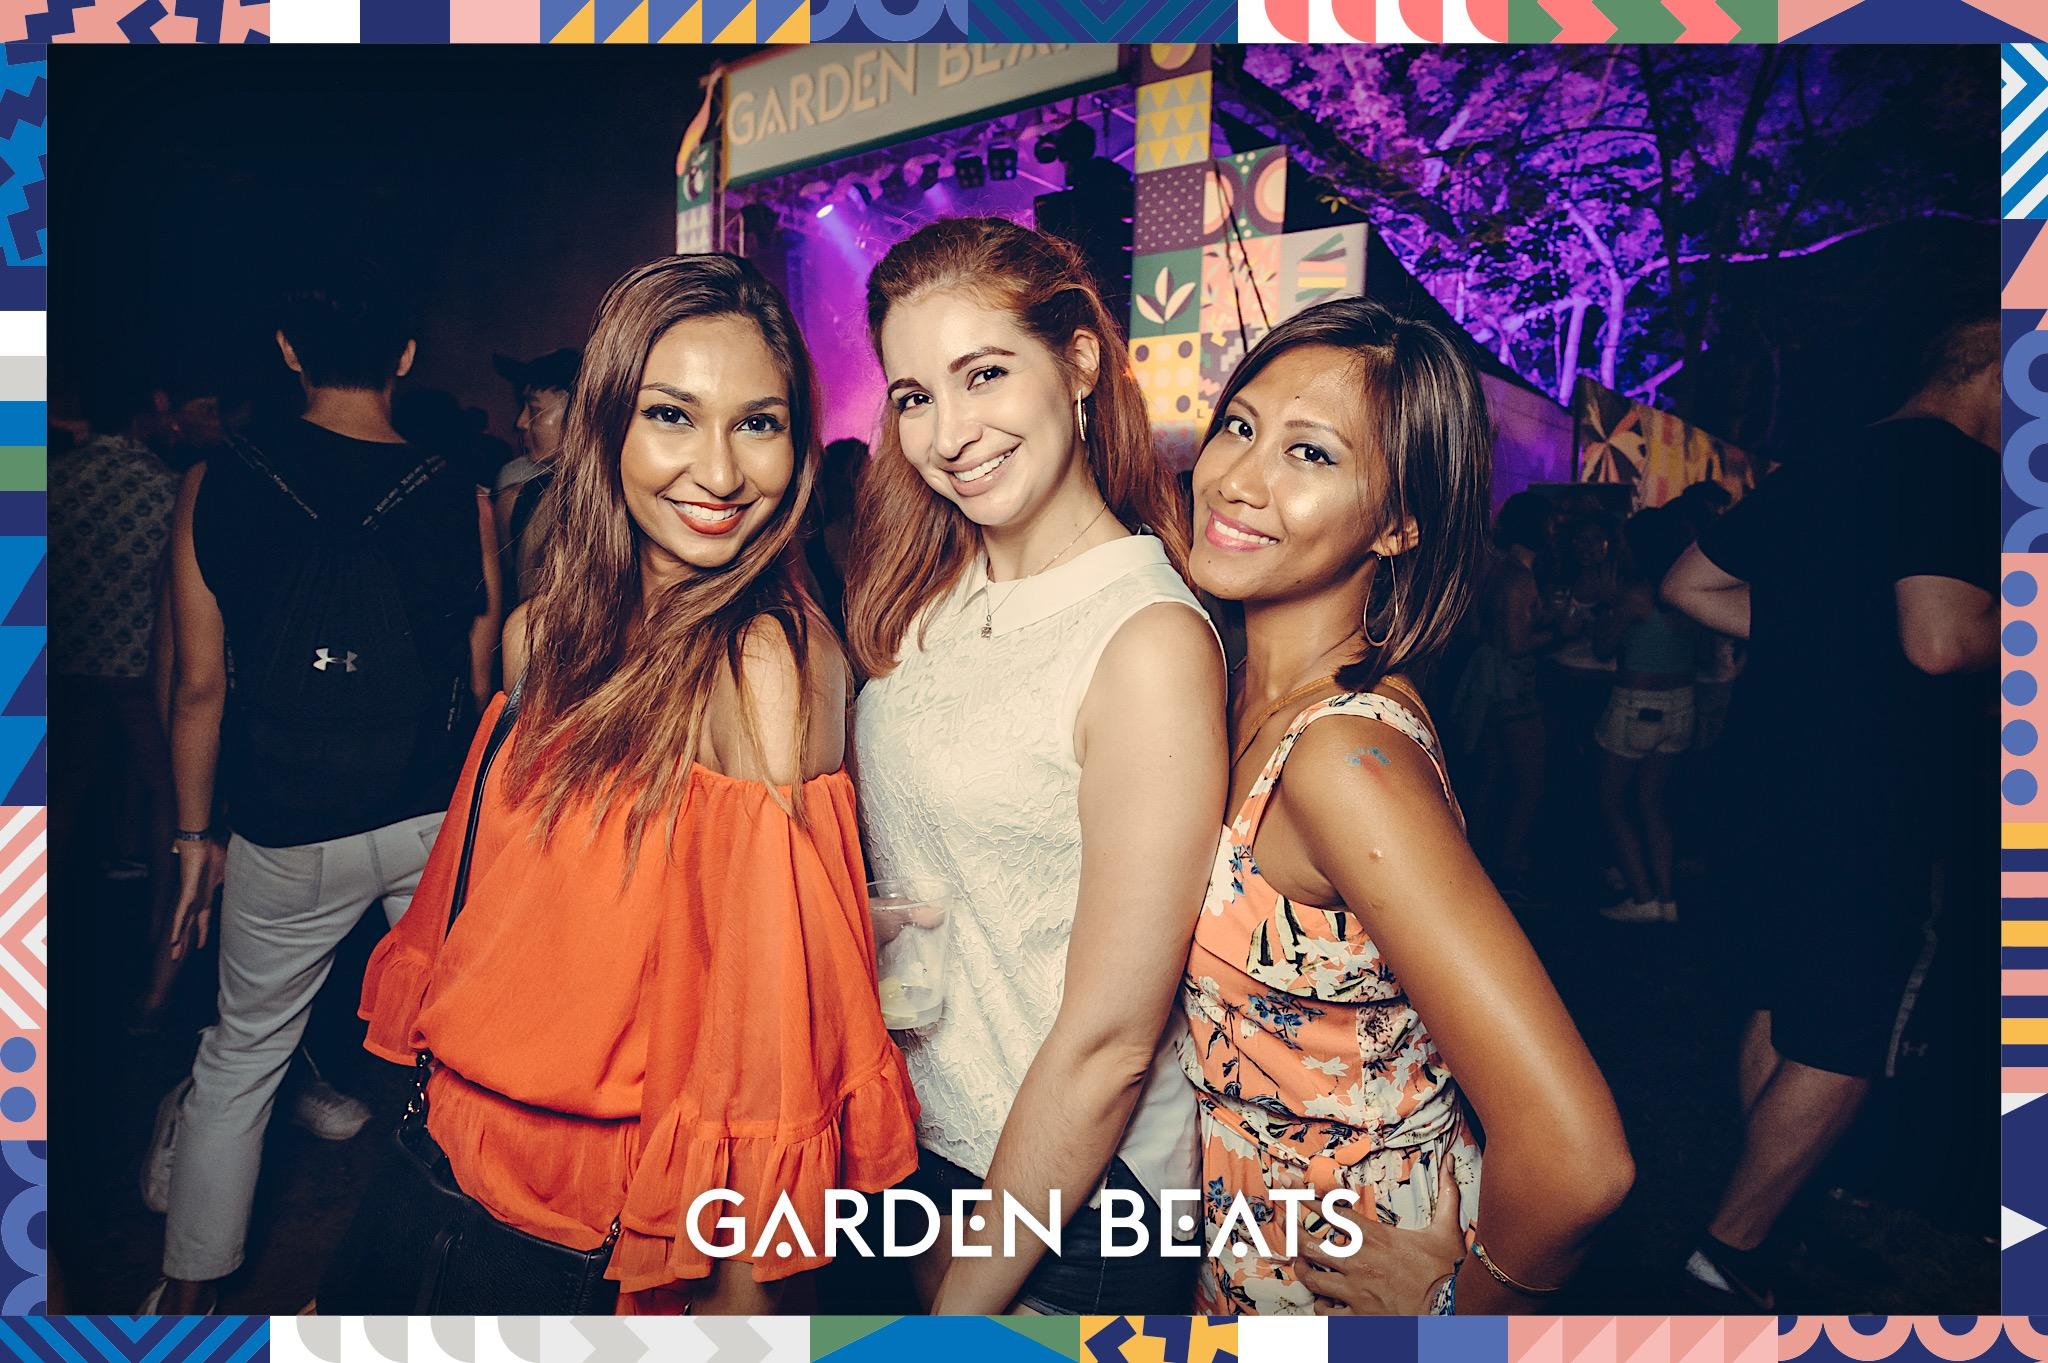 03032018_GardenBeats_Colossal845_Watermarked.jpg